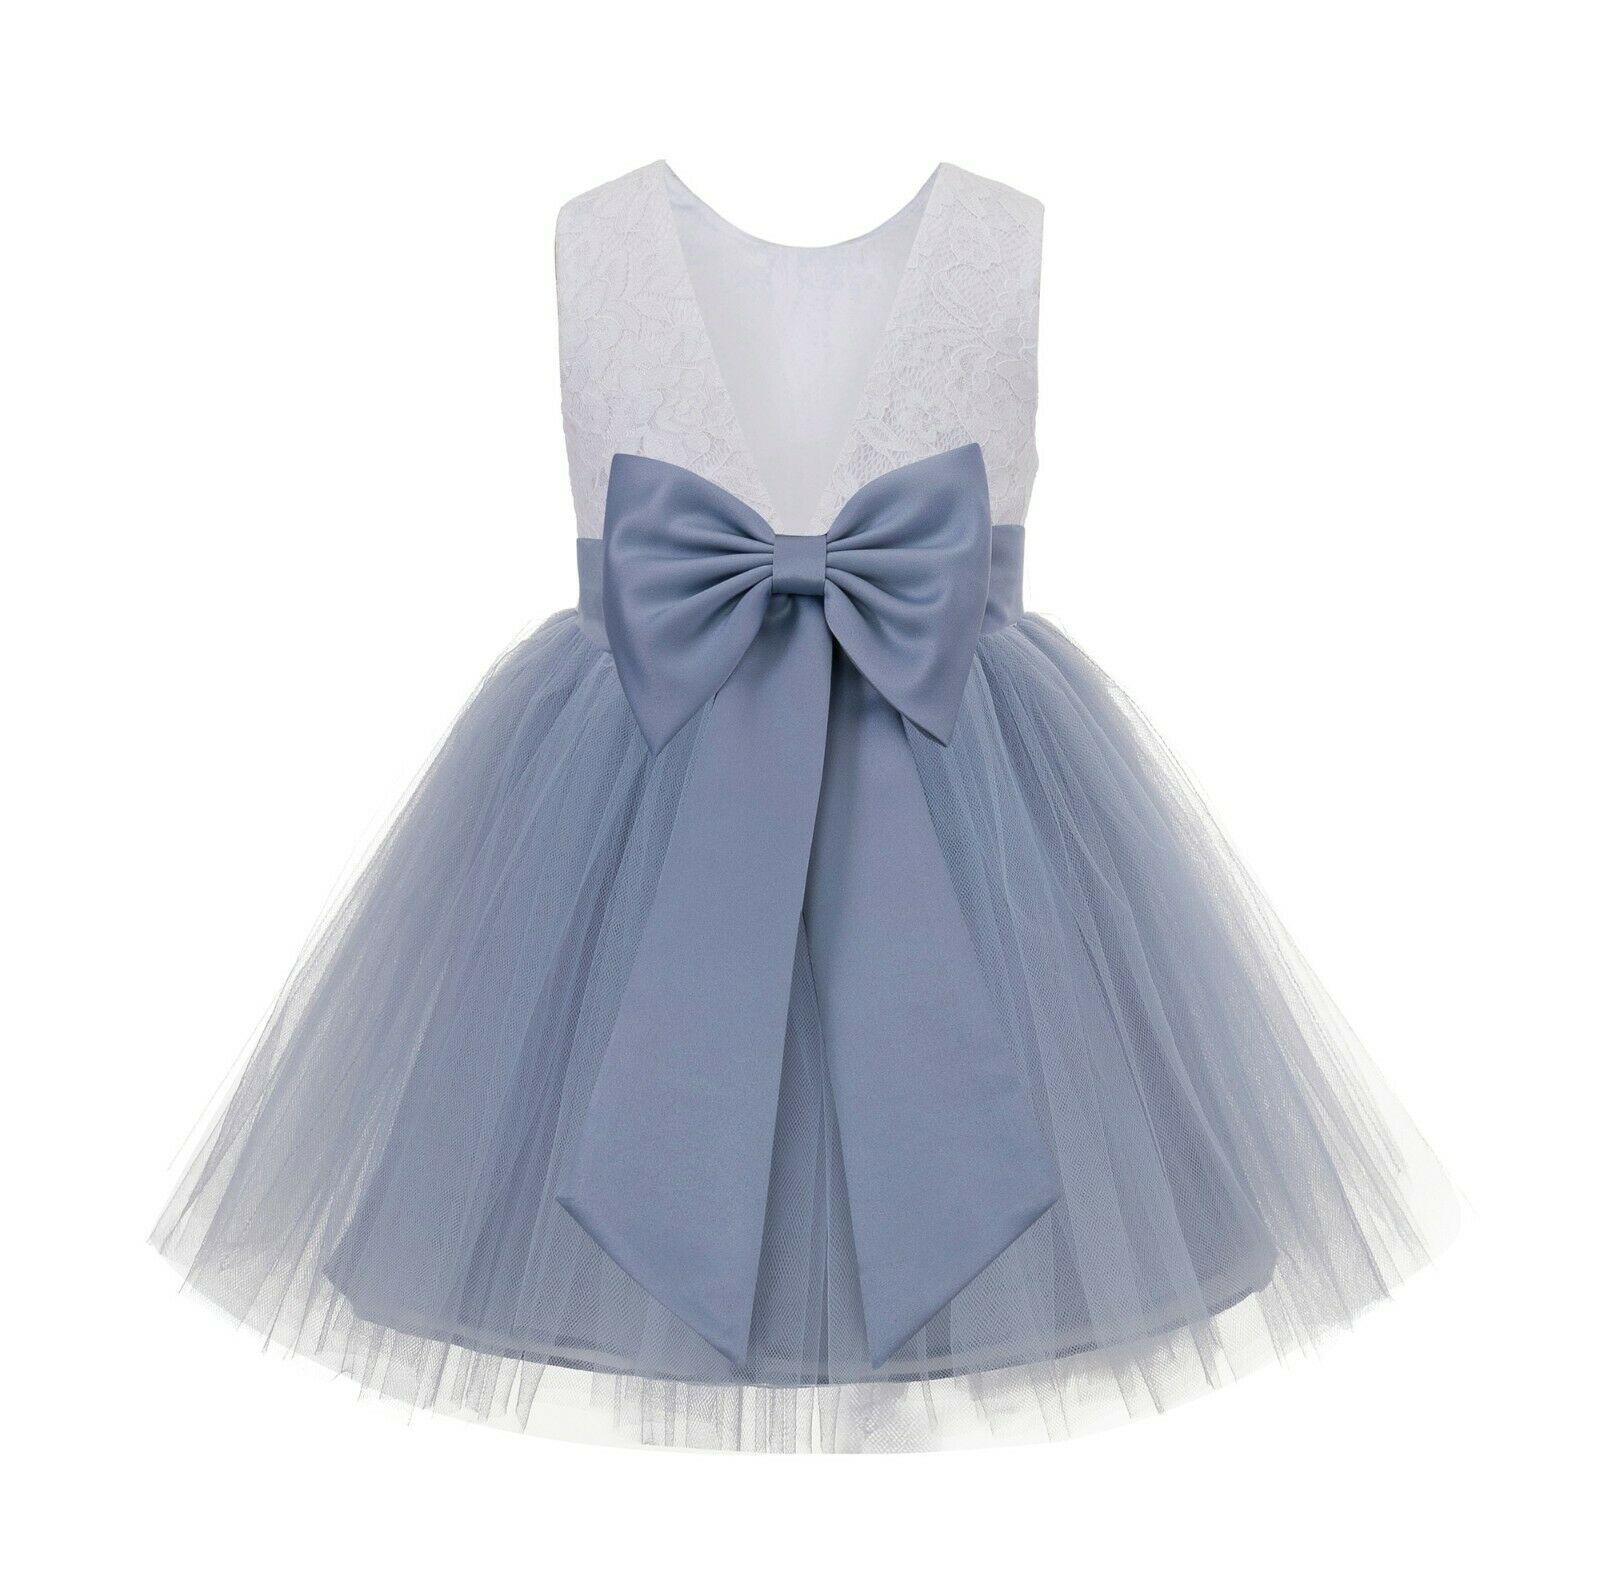 Backless Lace V-Back Flower Girl Dress Tulle Dresses Girl Dress Special Occasion